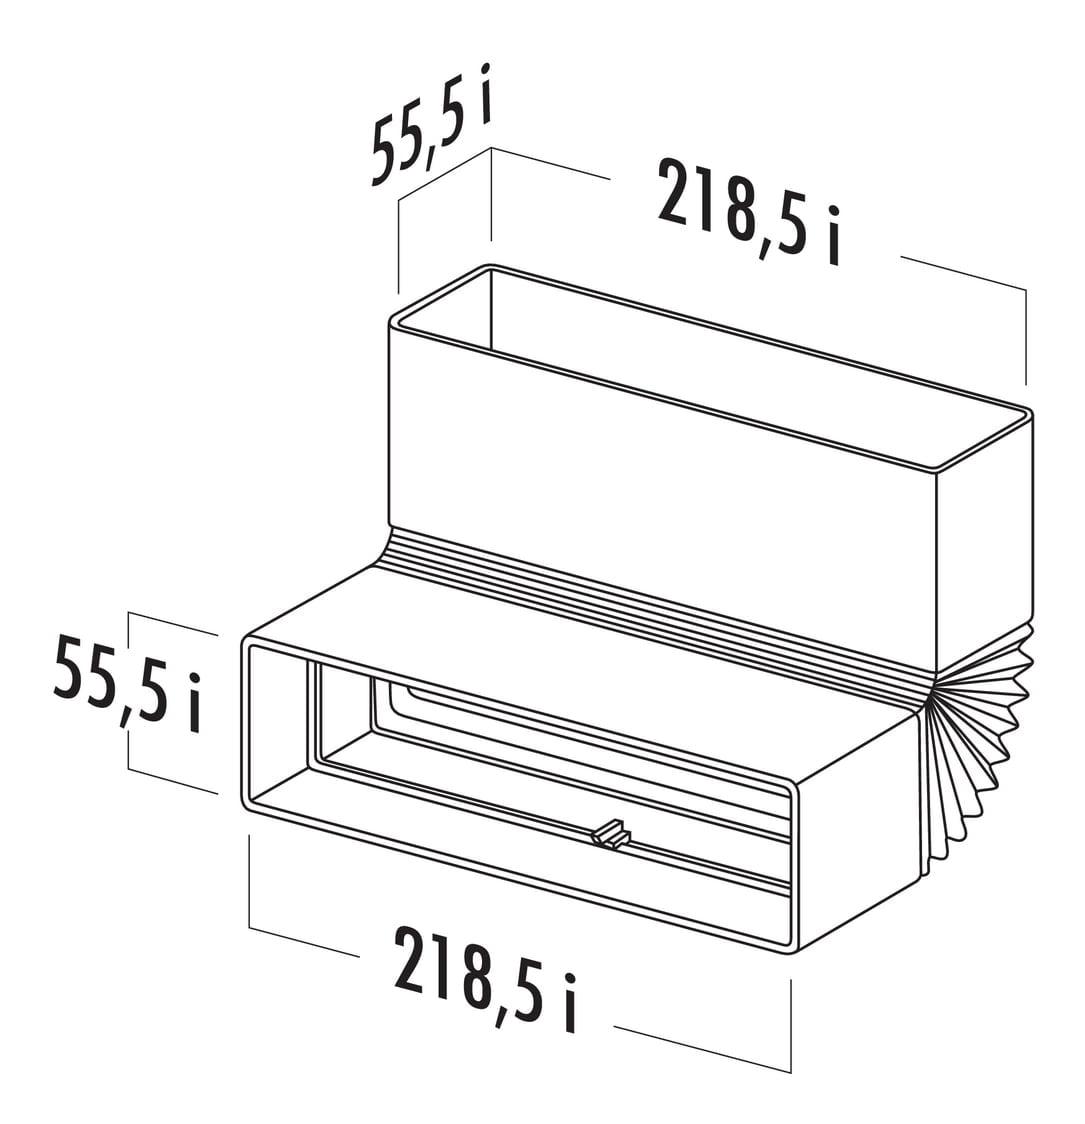 T-RBFLEX 125 Brede buisbocht, Verbindingselement., wit